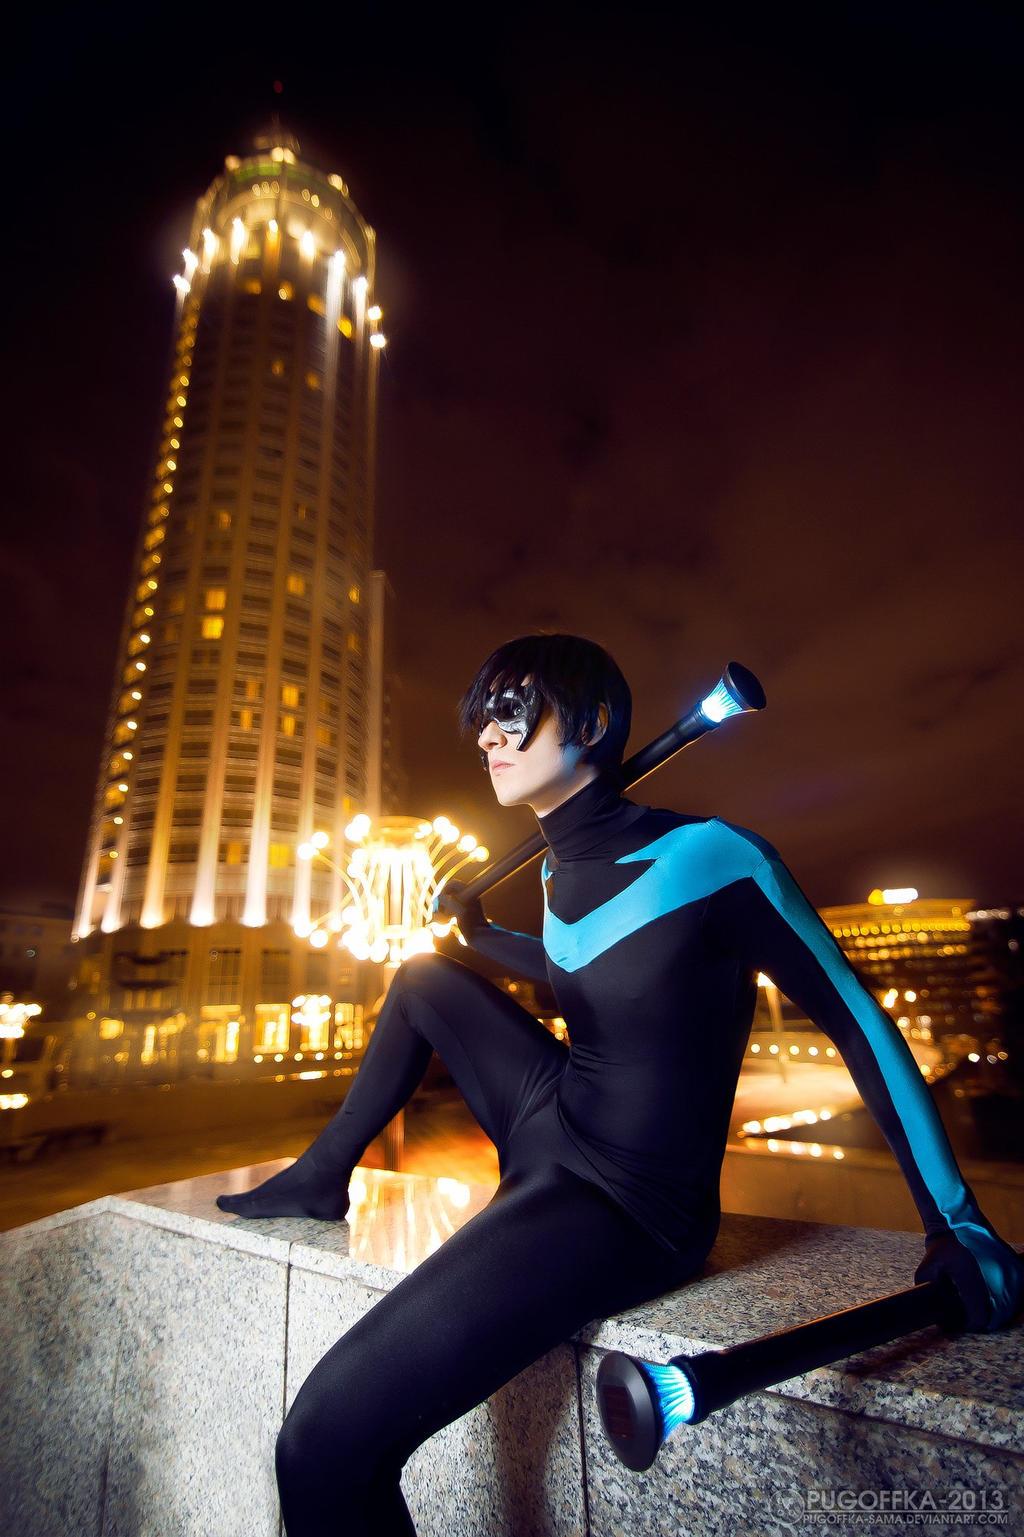 Nightwing by AmethystPrince